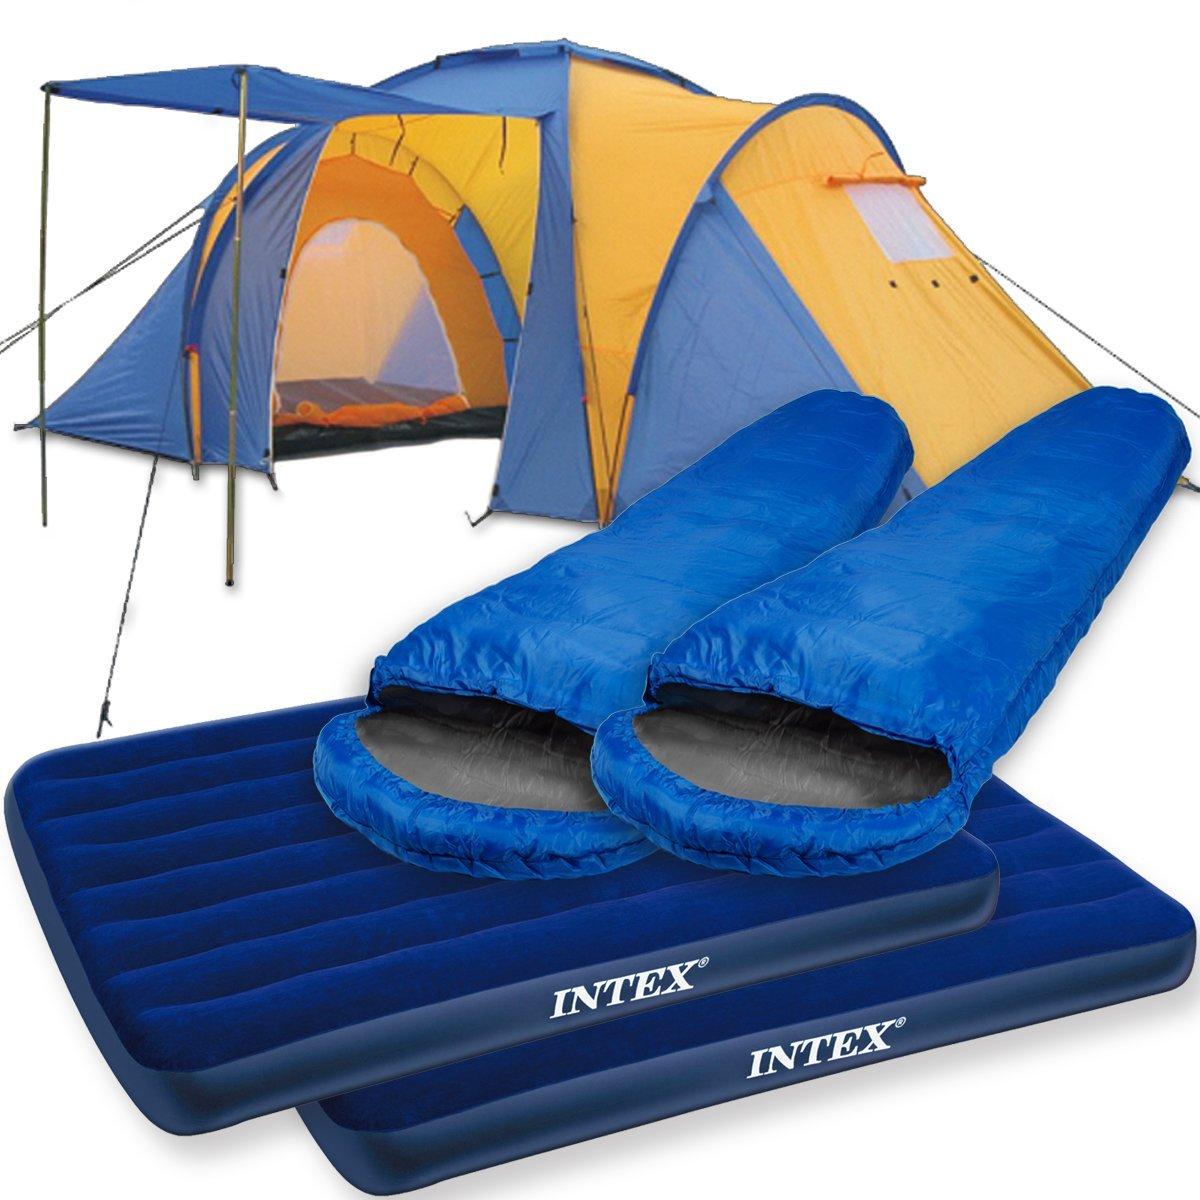 Camping-Komplett-Set / Zeltset bestehend aus Monkey Mountain Zelt + 2x Luftbett + 2x Mumienschlafsack